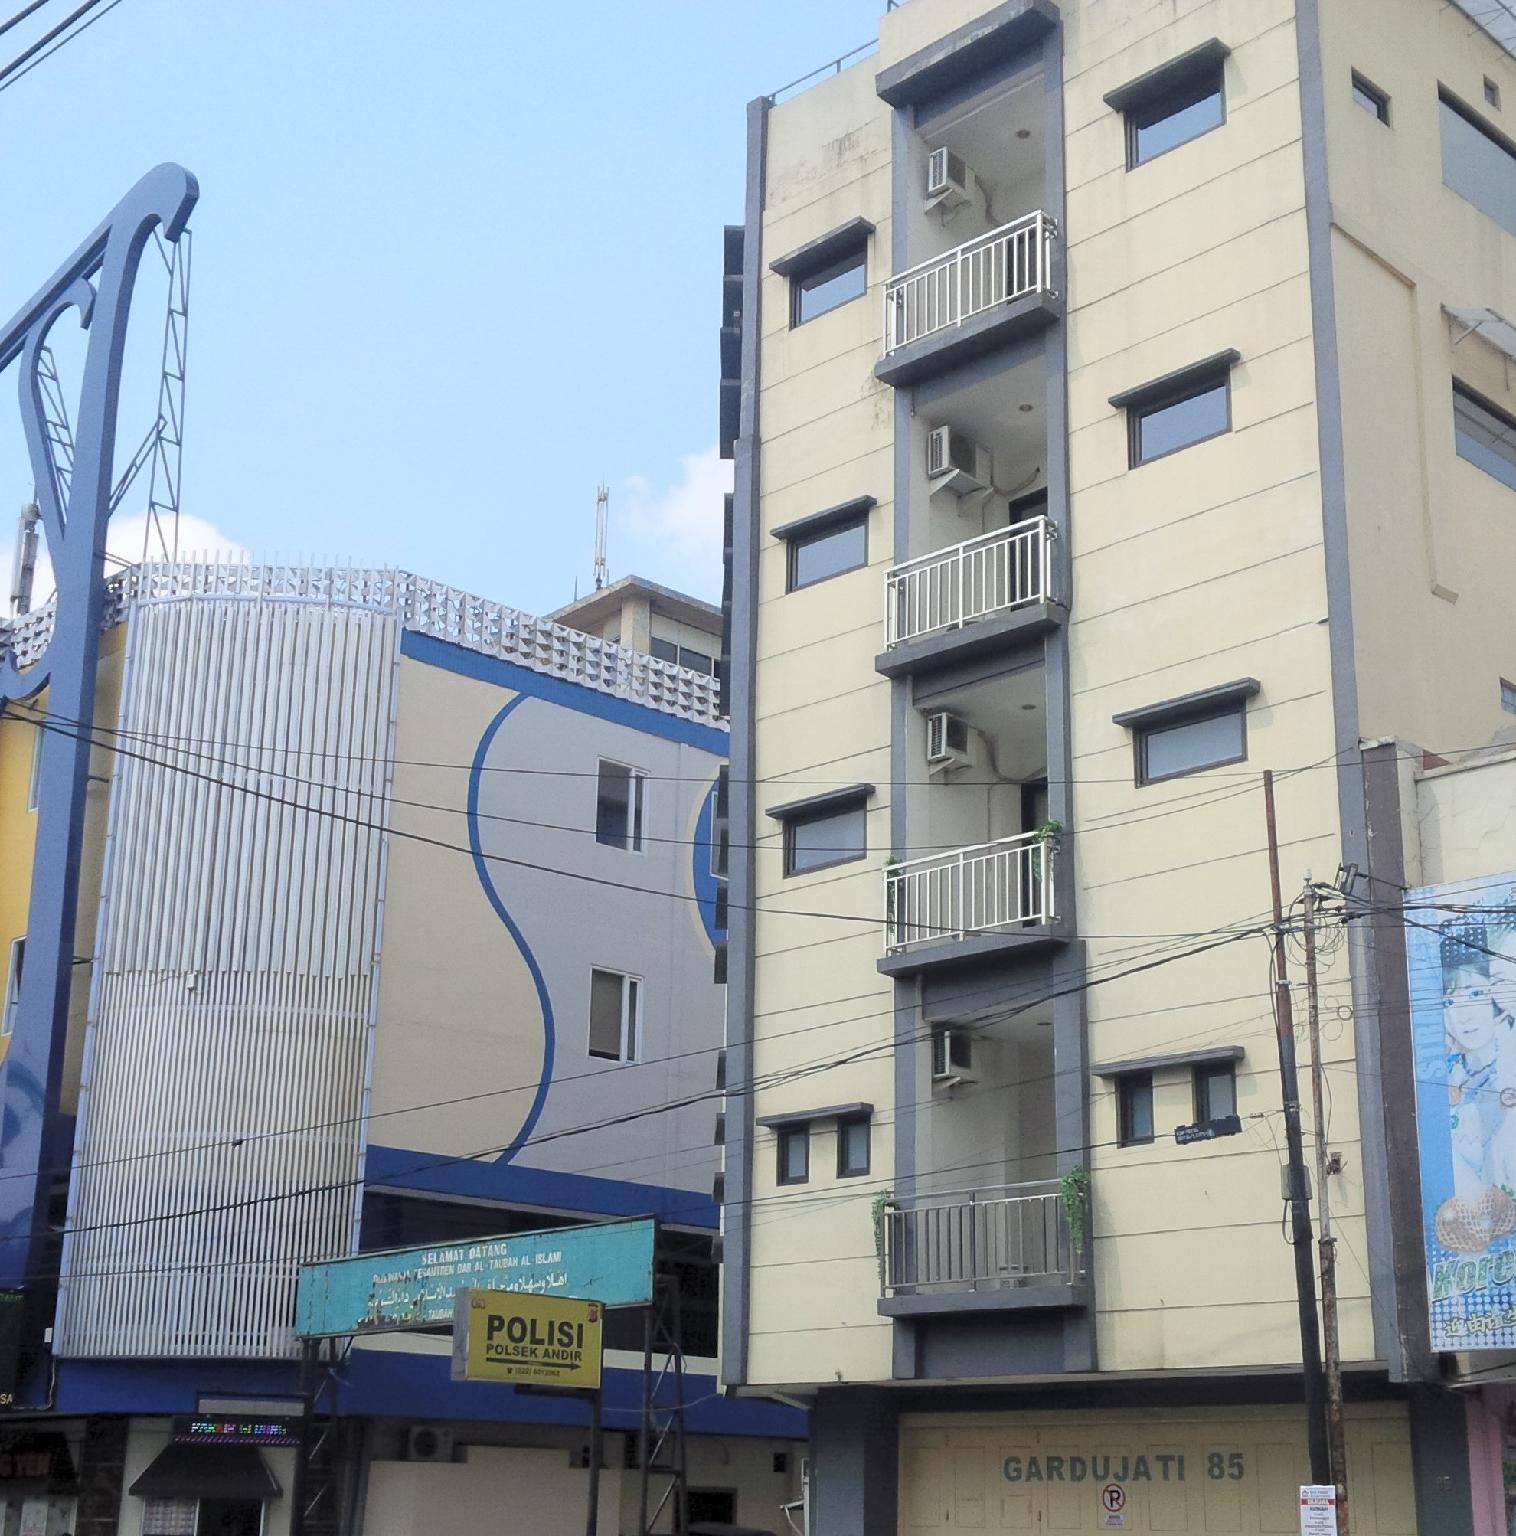 Apartment Gardujati 85, Bandung